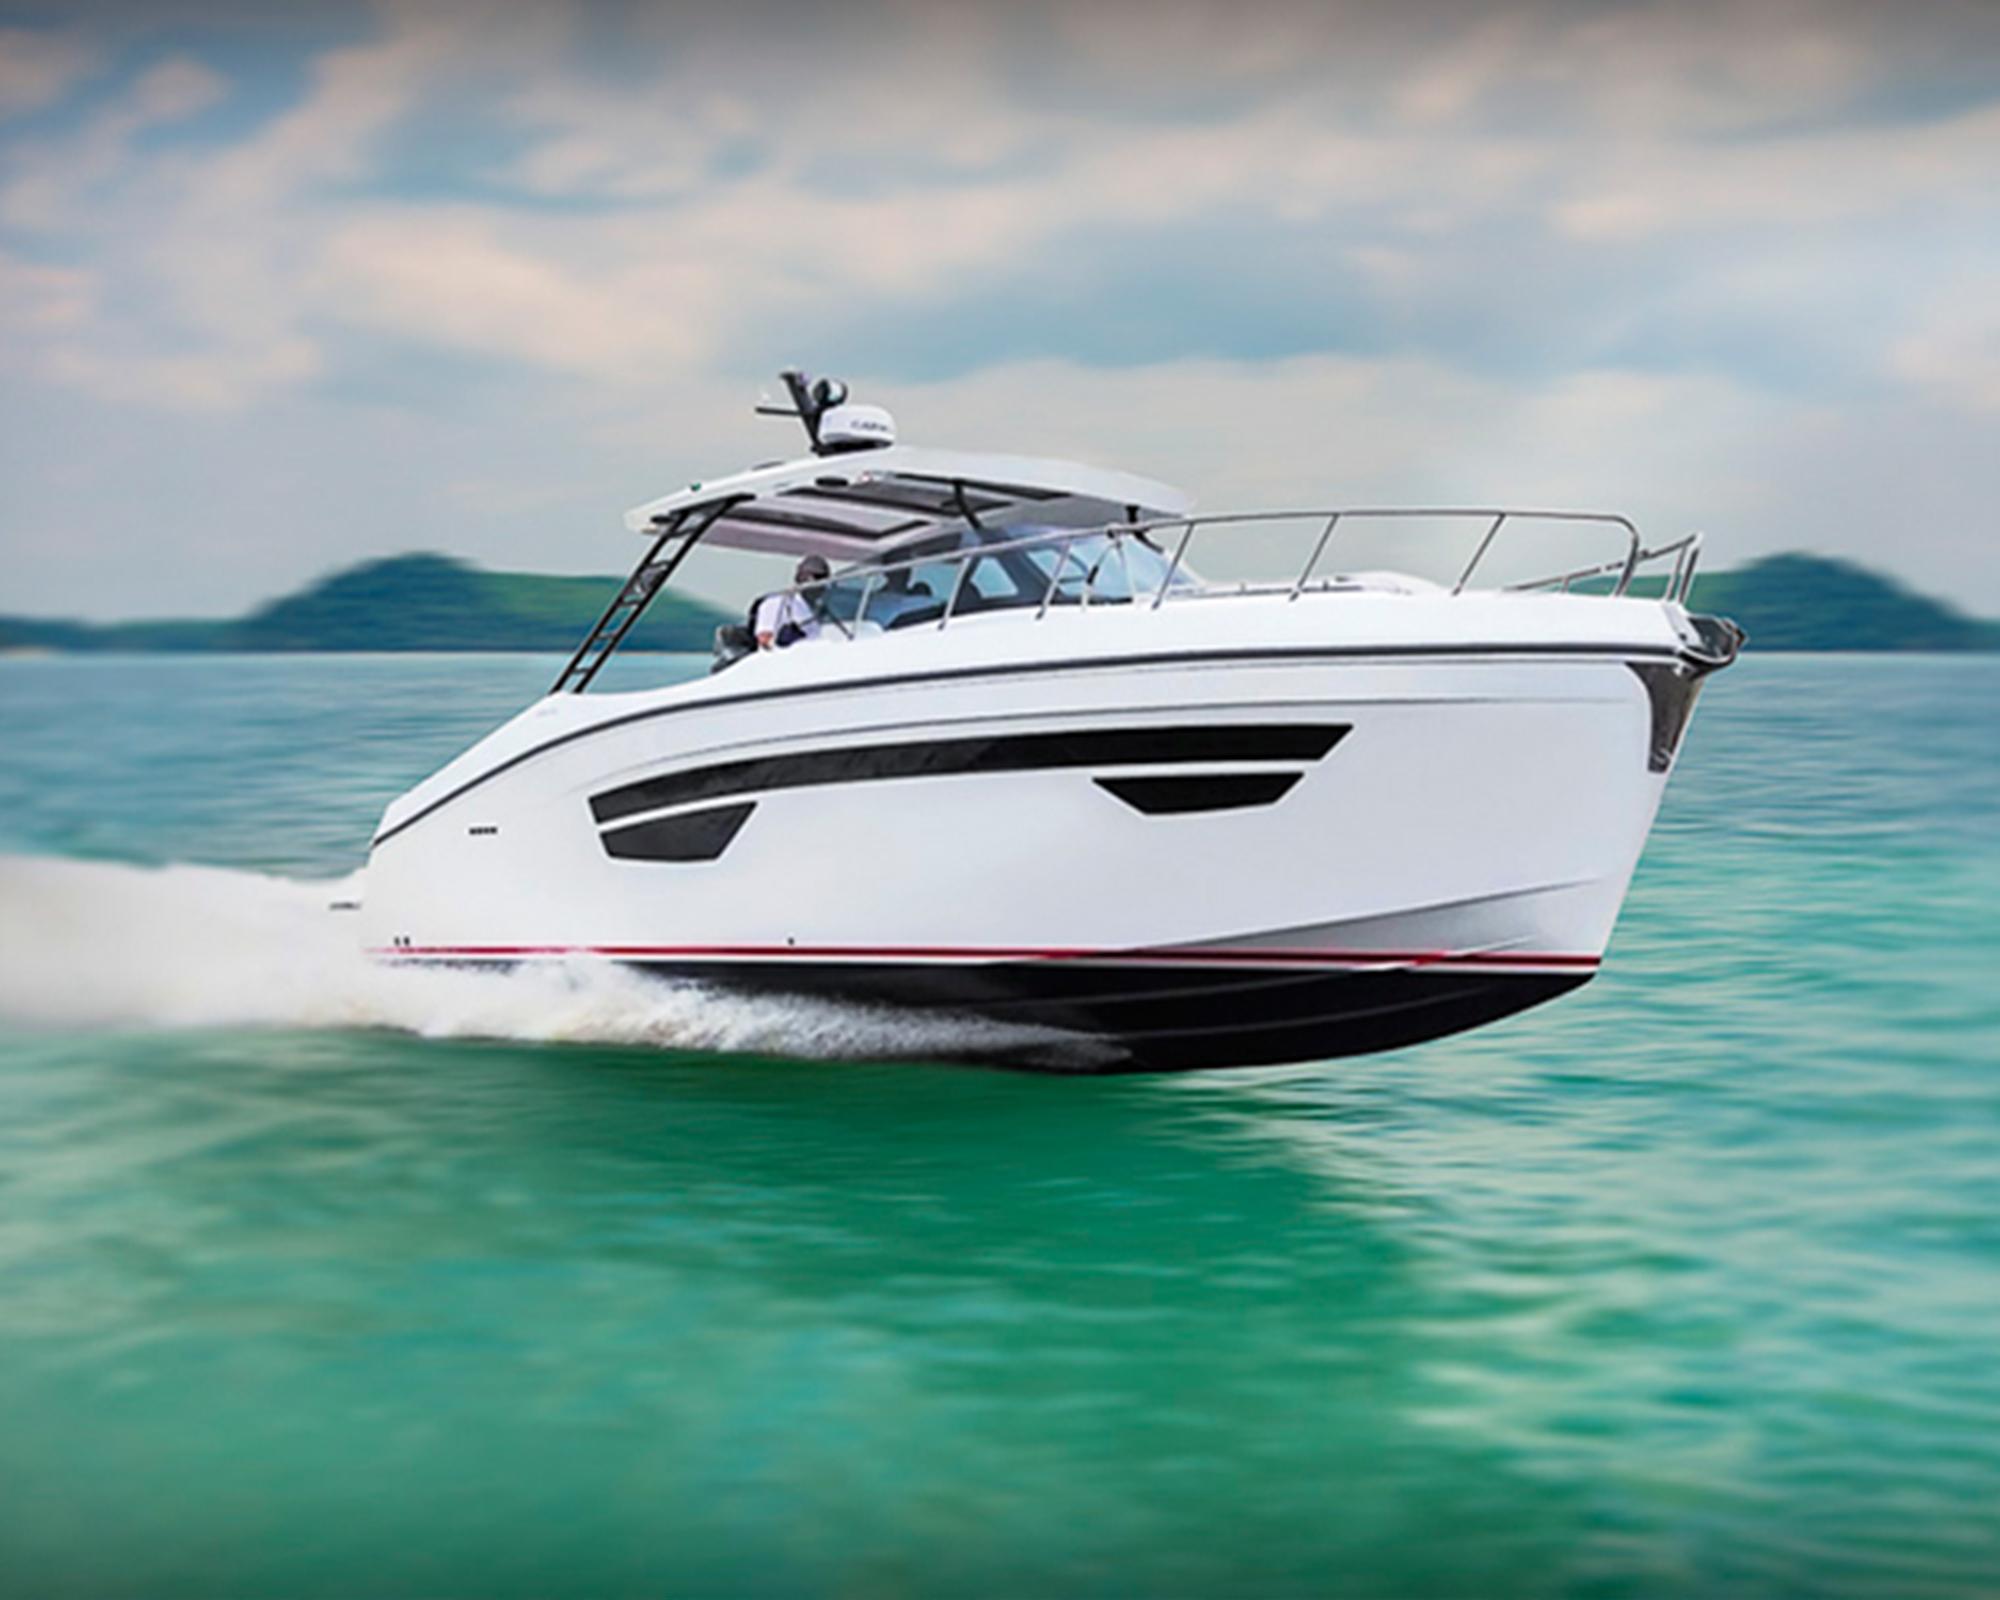 The all-new Oryx 379 sport cruiser